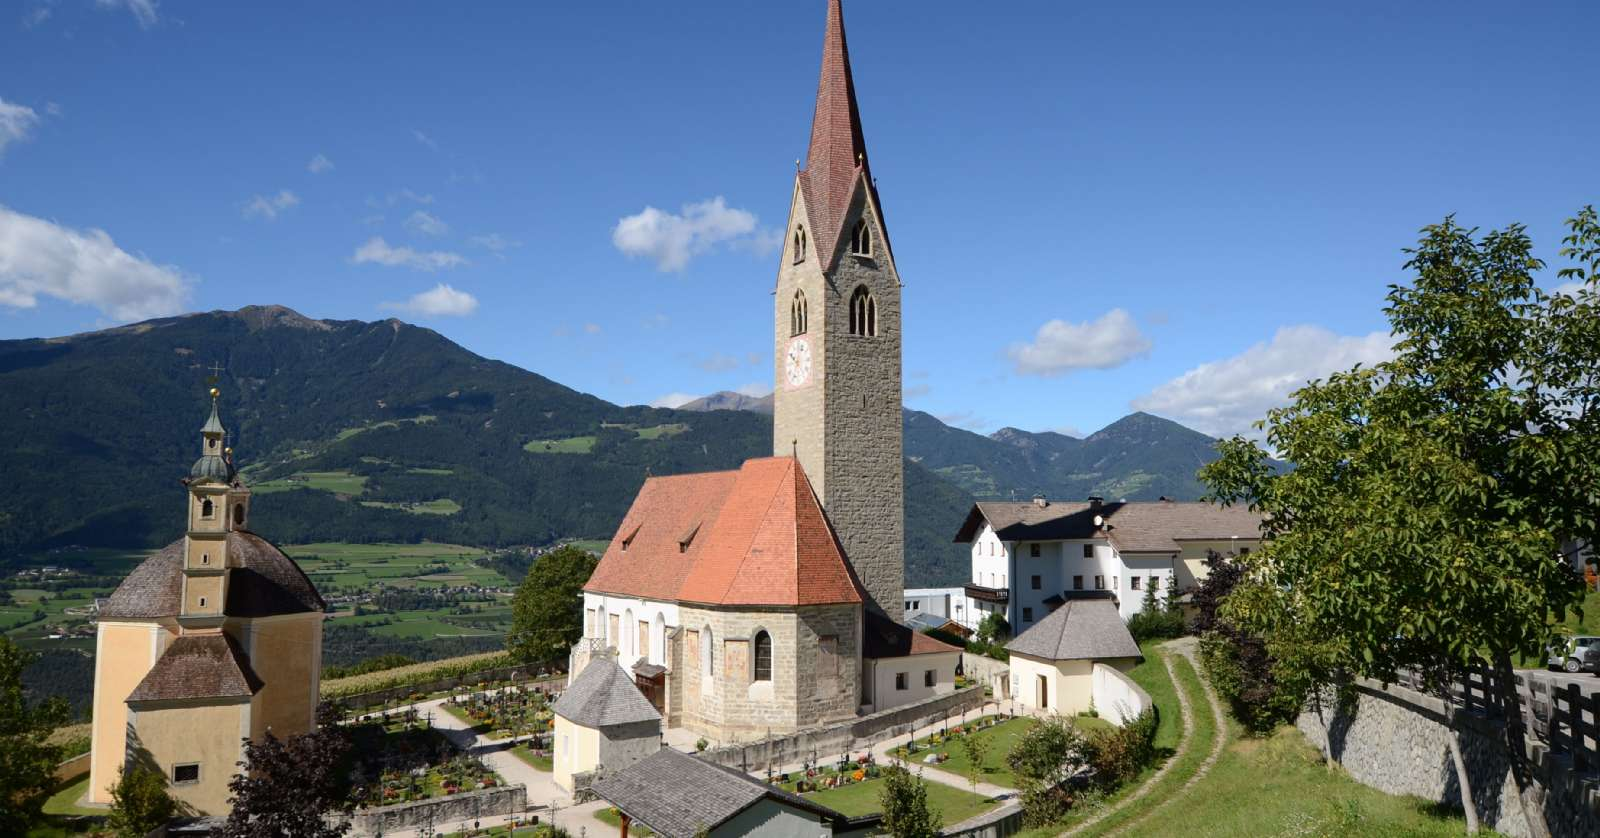 Die Kirche im Dorf Sant'Andrea